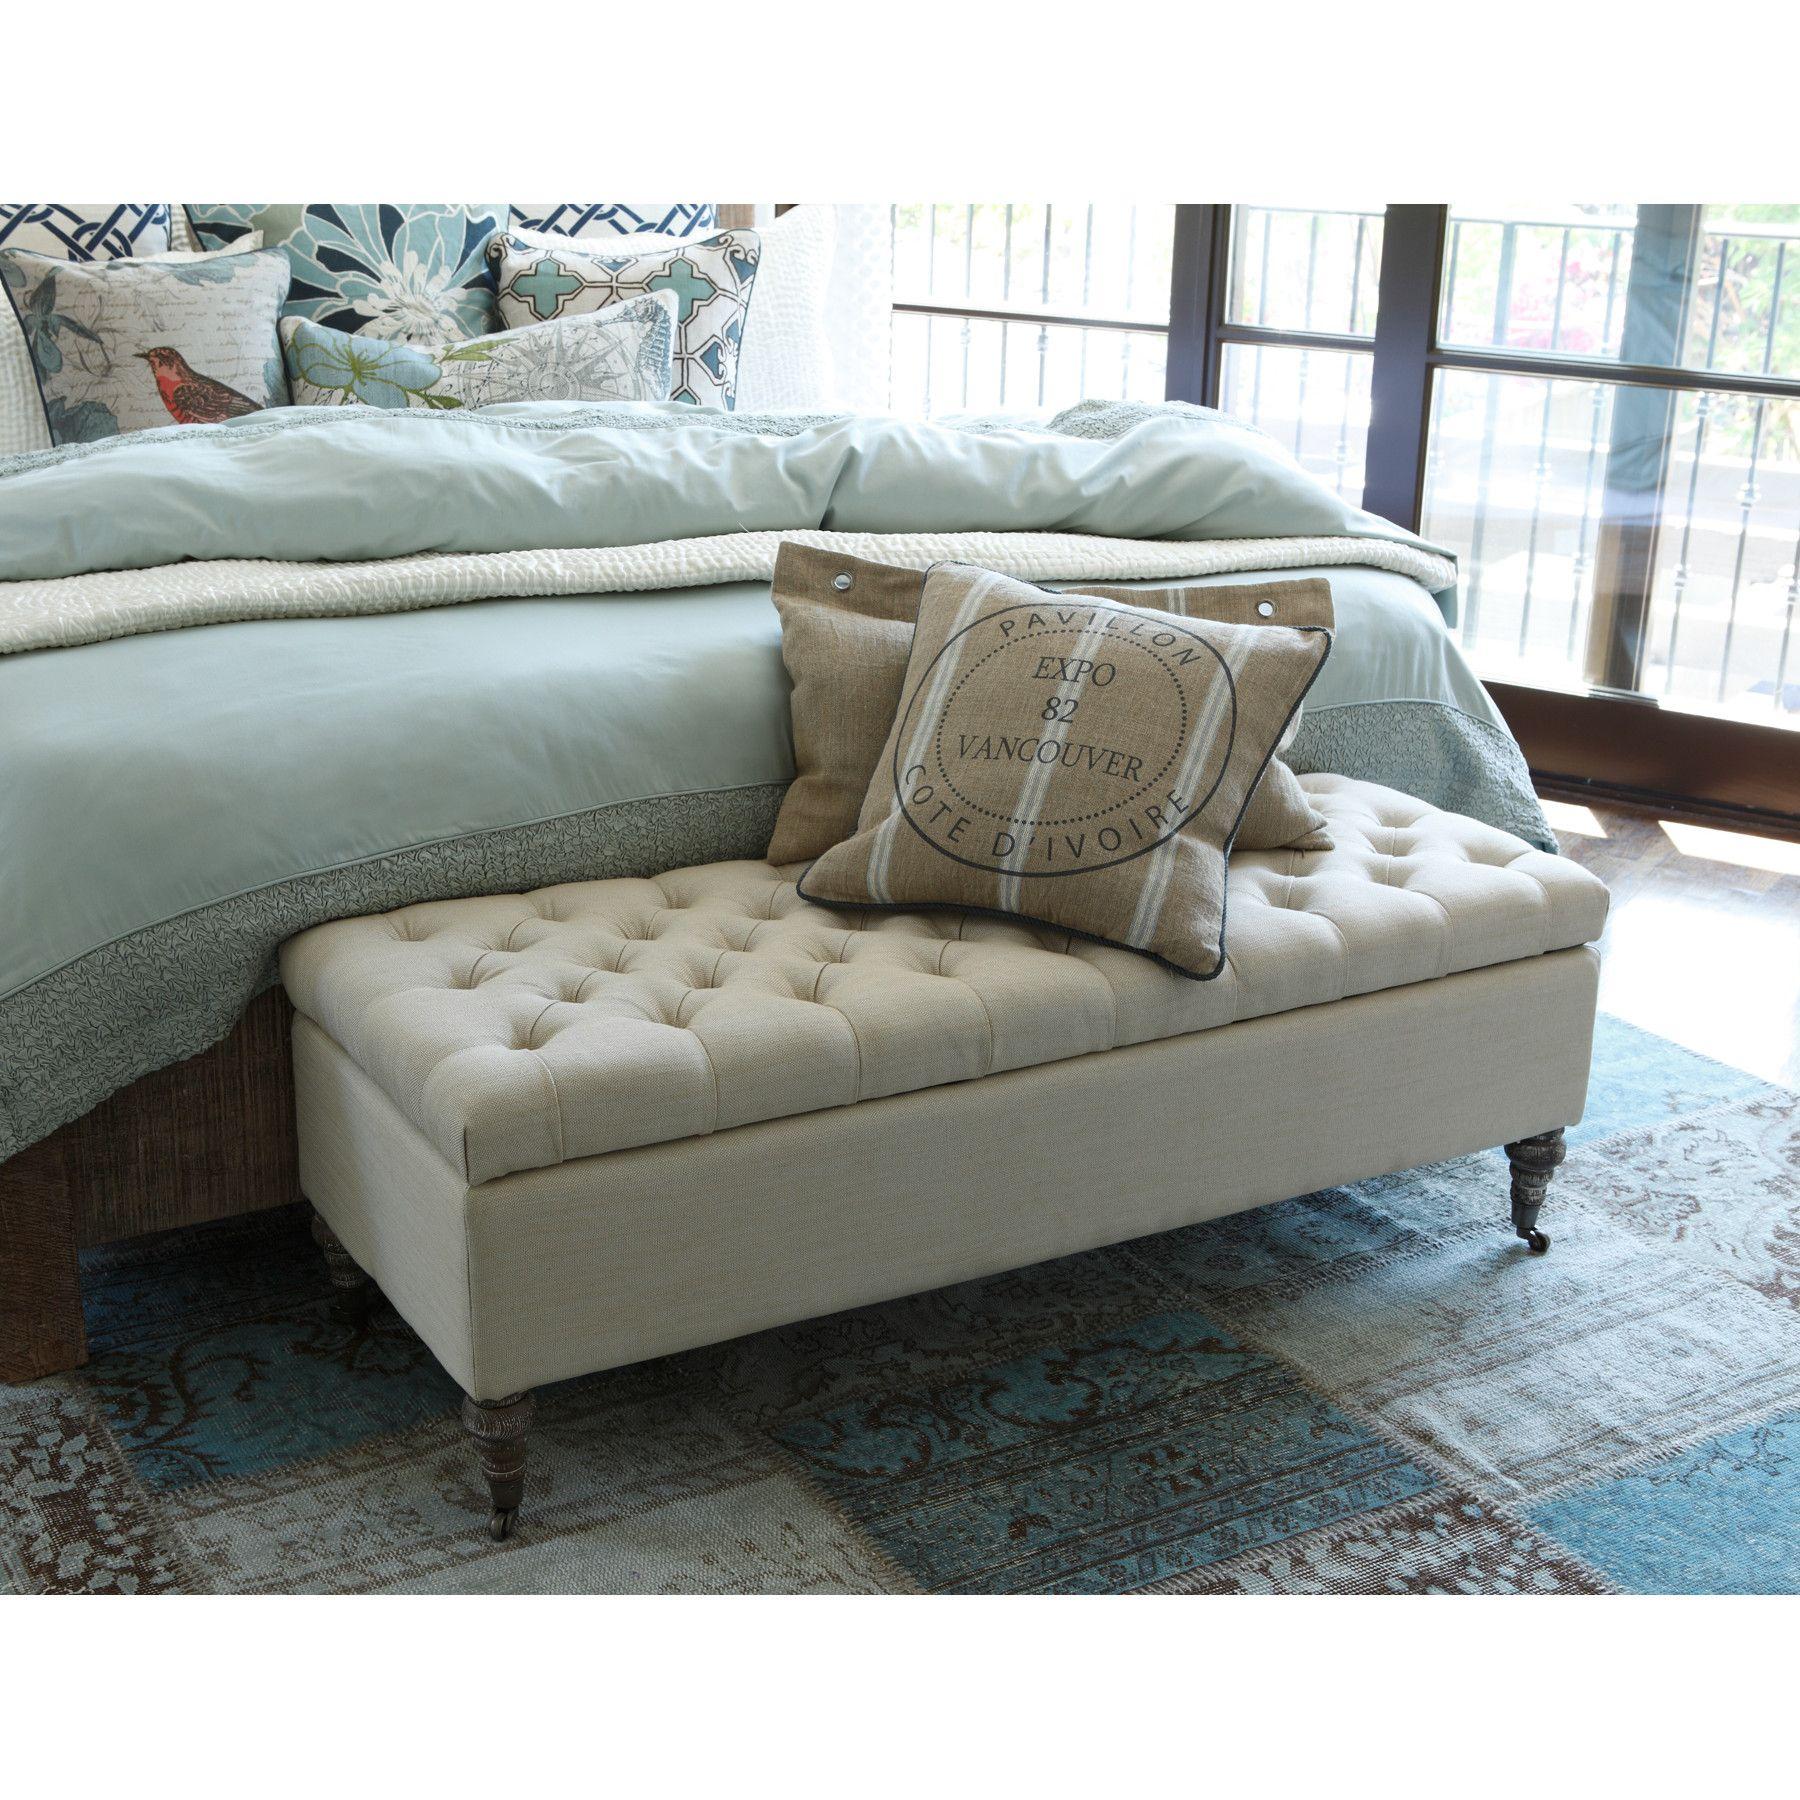 Kosas Home Serena Tufted Storage Bench Storage Bench Bedroom